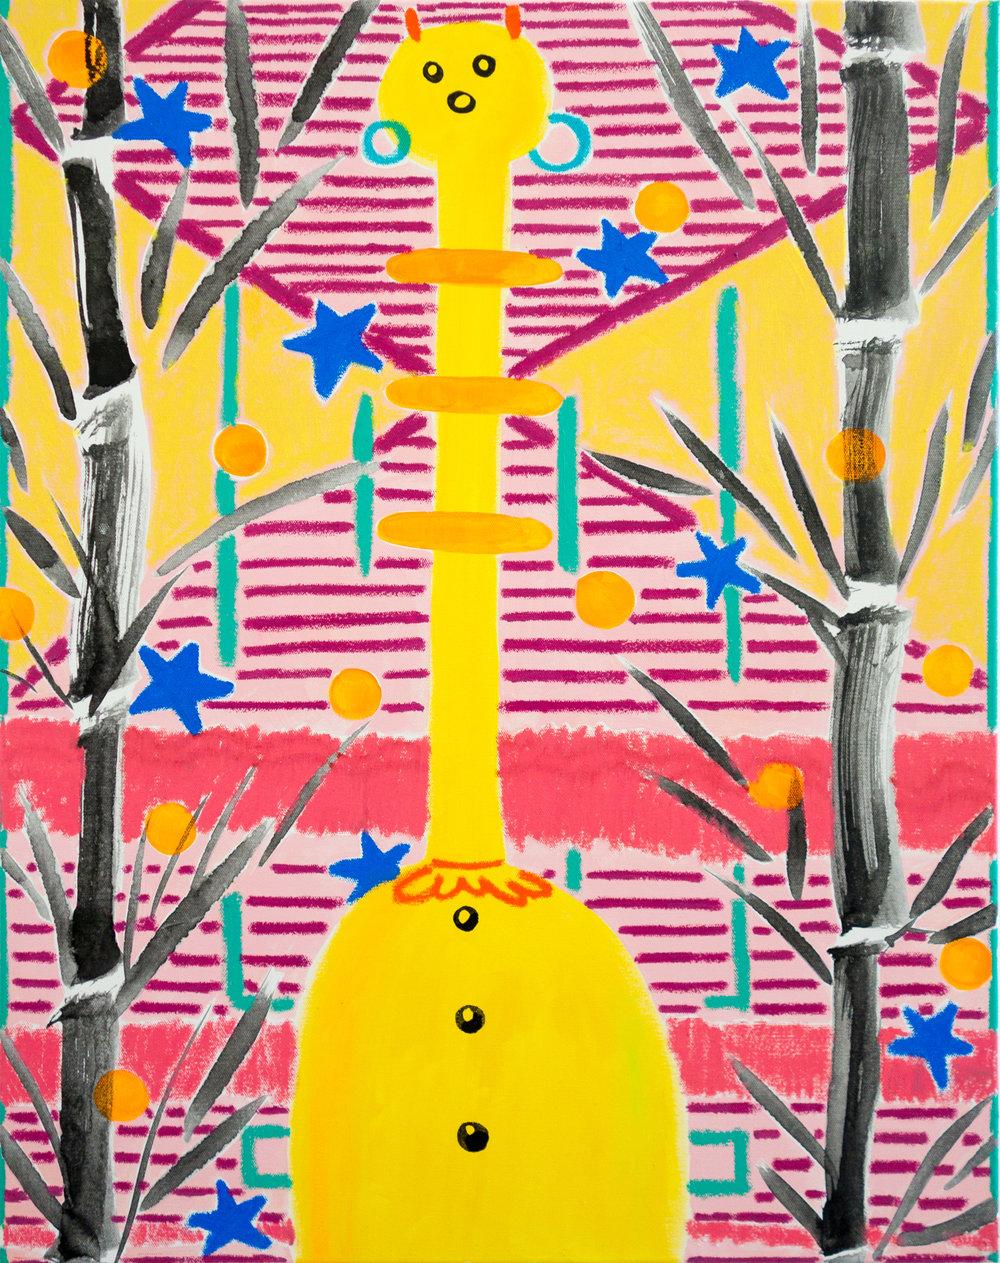 Space Giraffe/Qilin